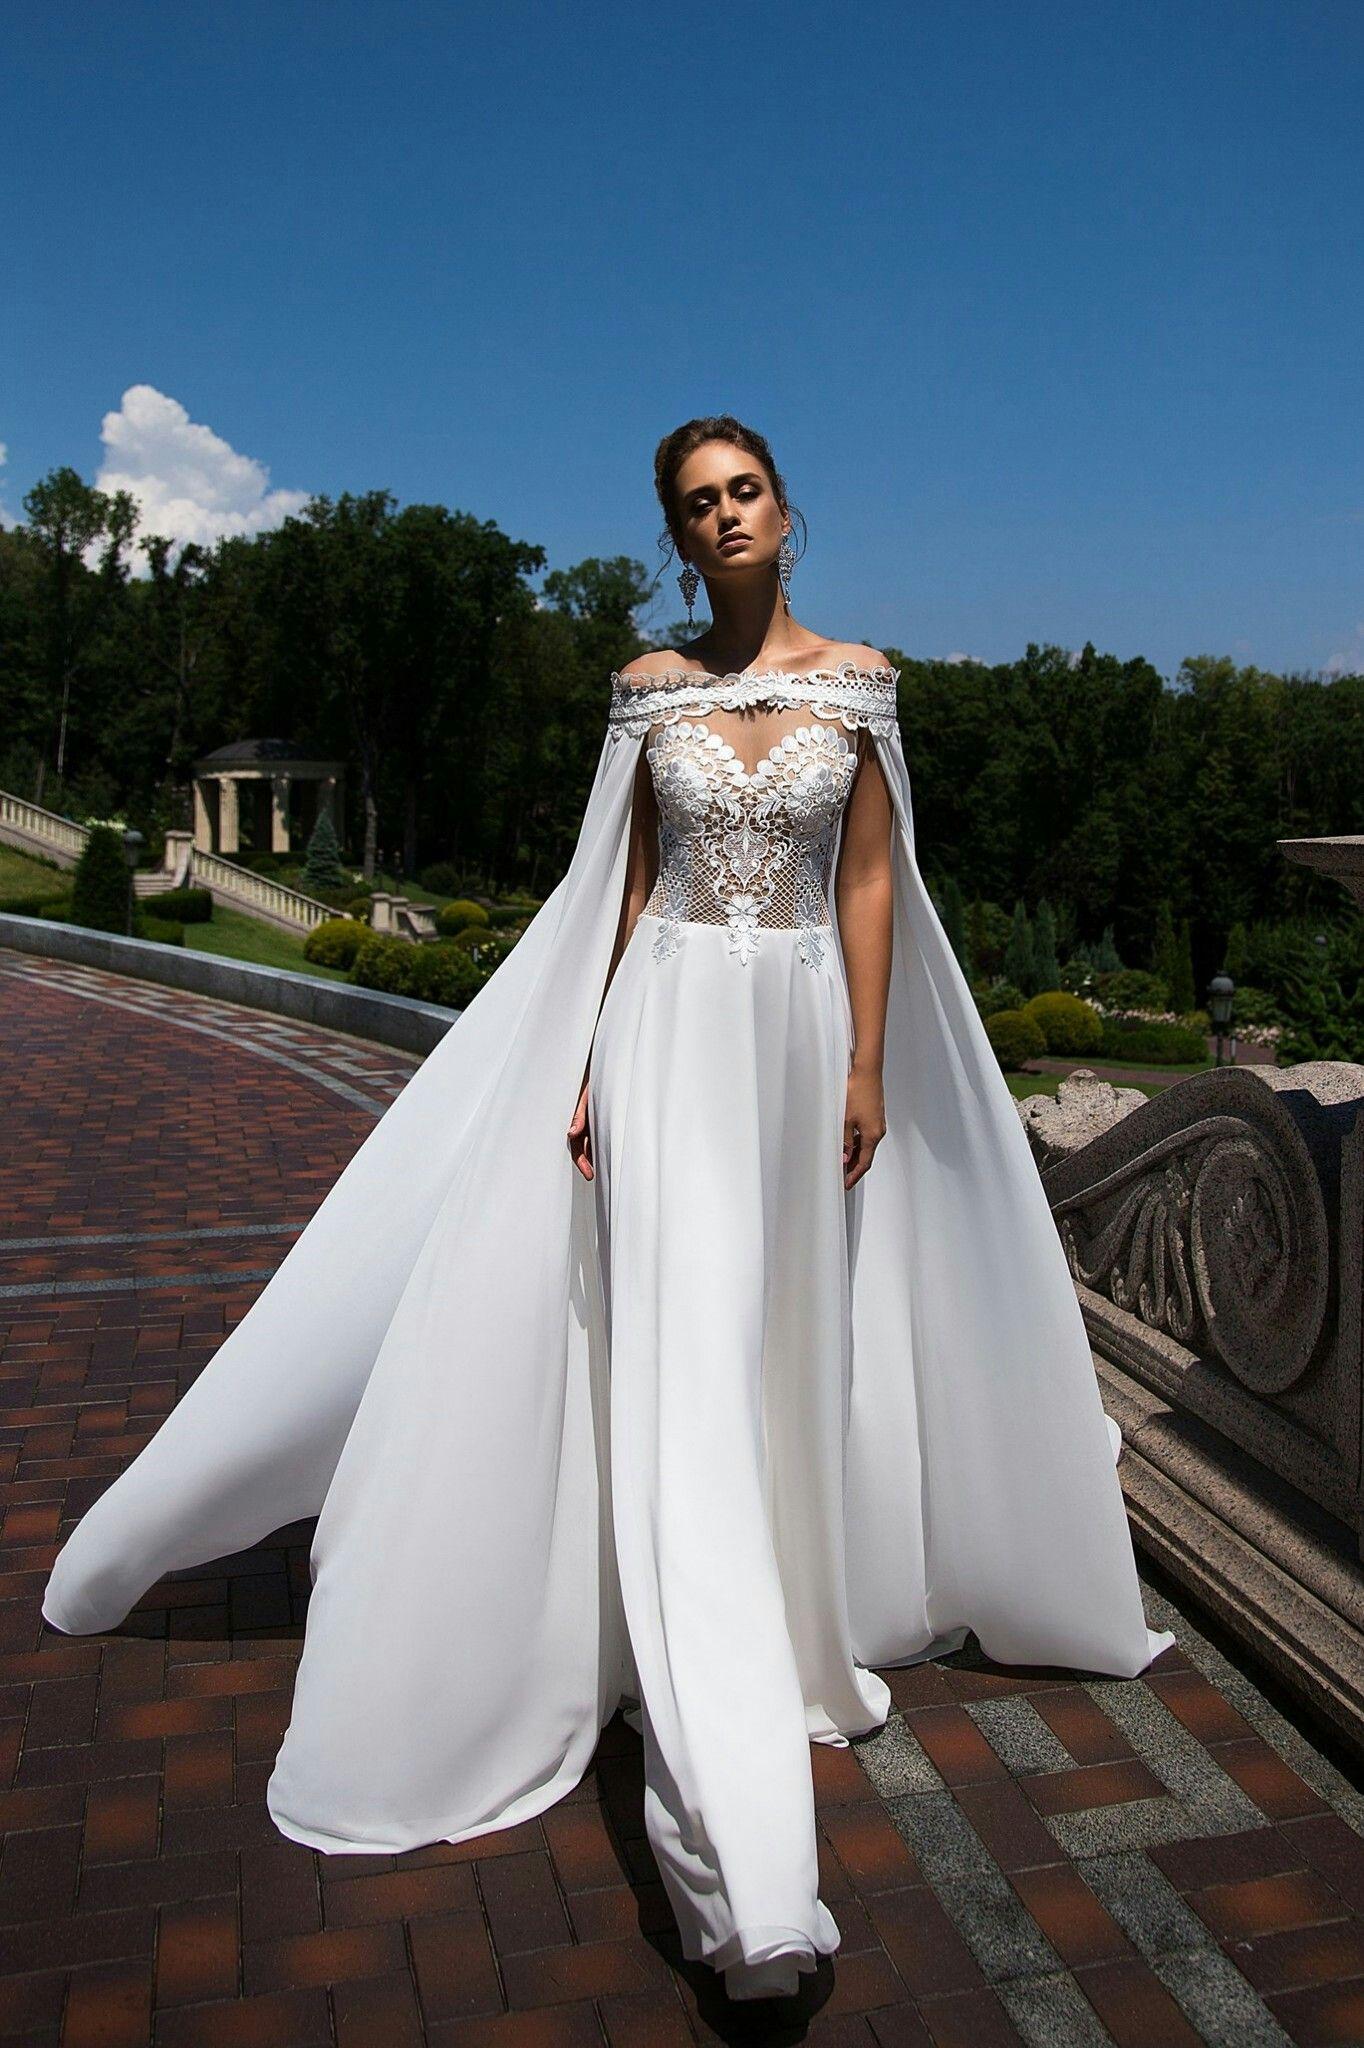 Elite wedding dresses  Pin by Vanda Desiree on Wedding dresses  Pinterest  Wedding